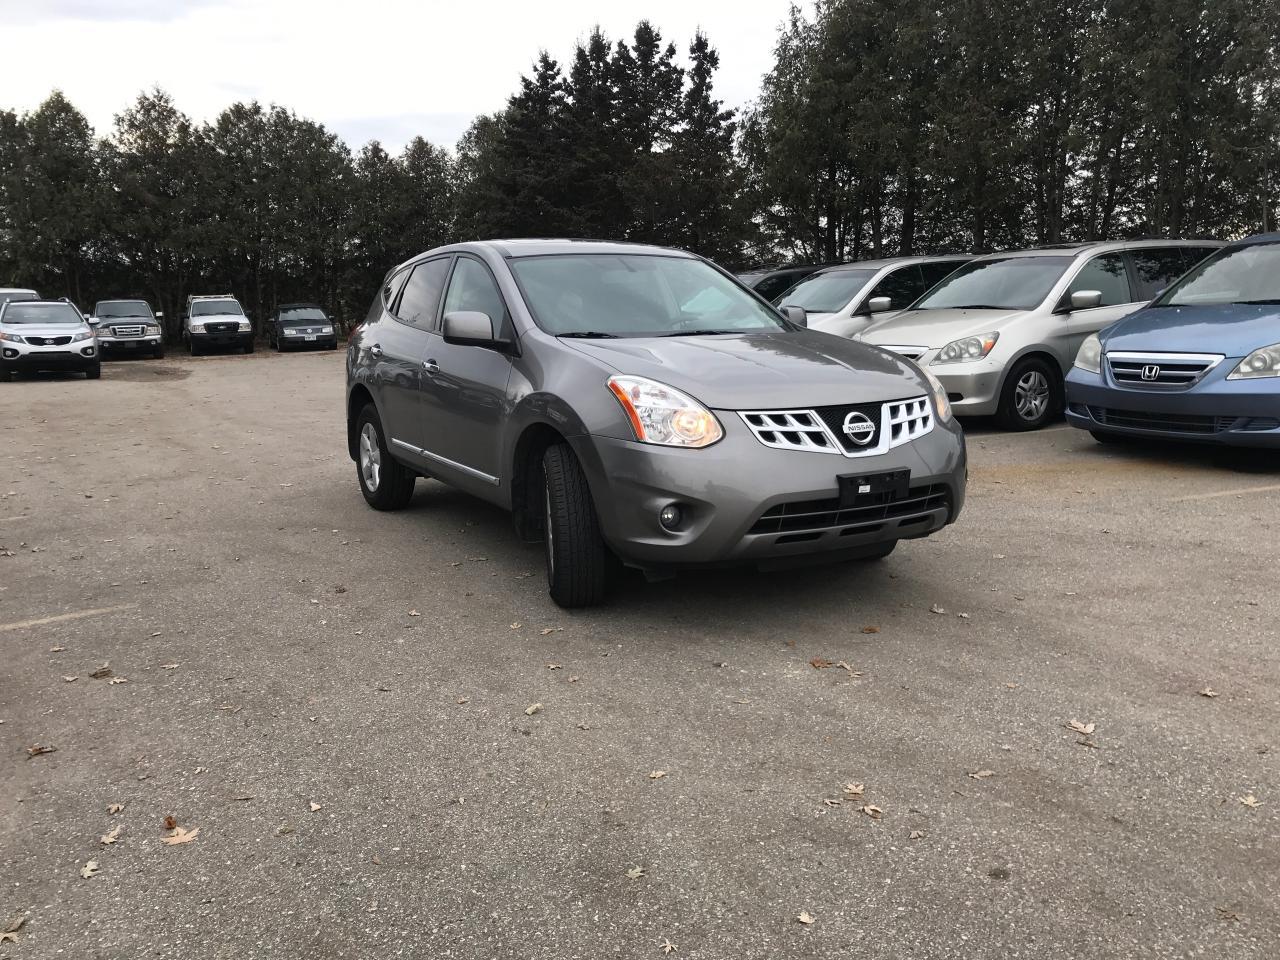 Photo of Gray 2013 Nissan Rogue